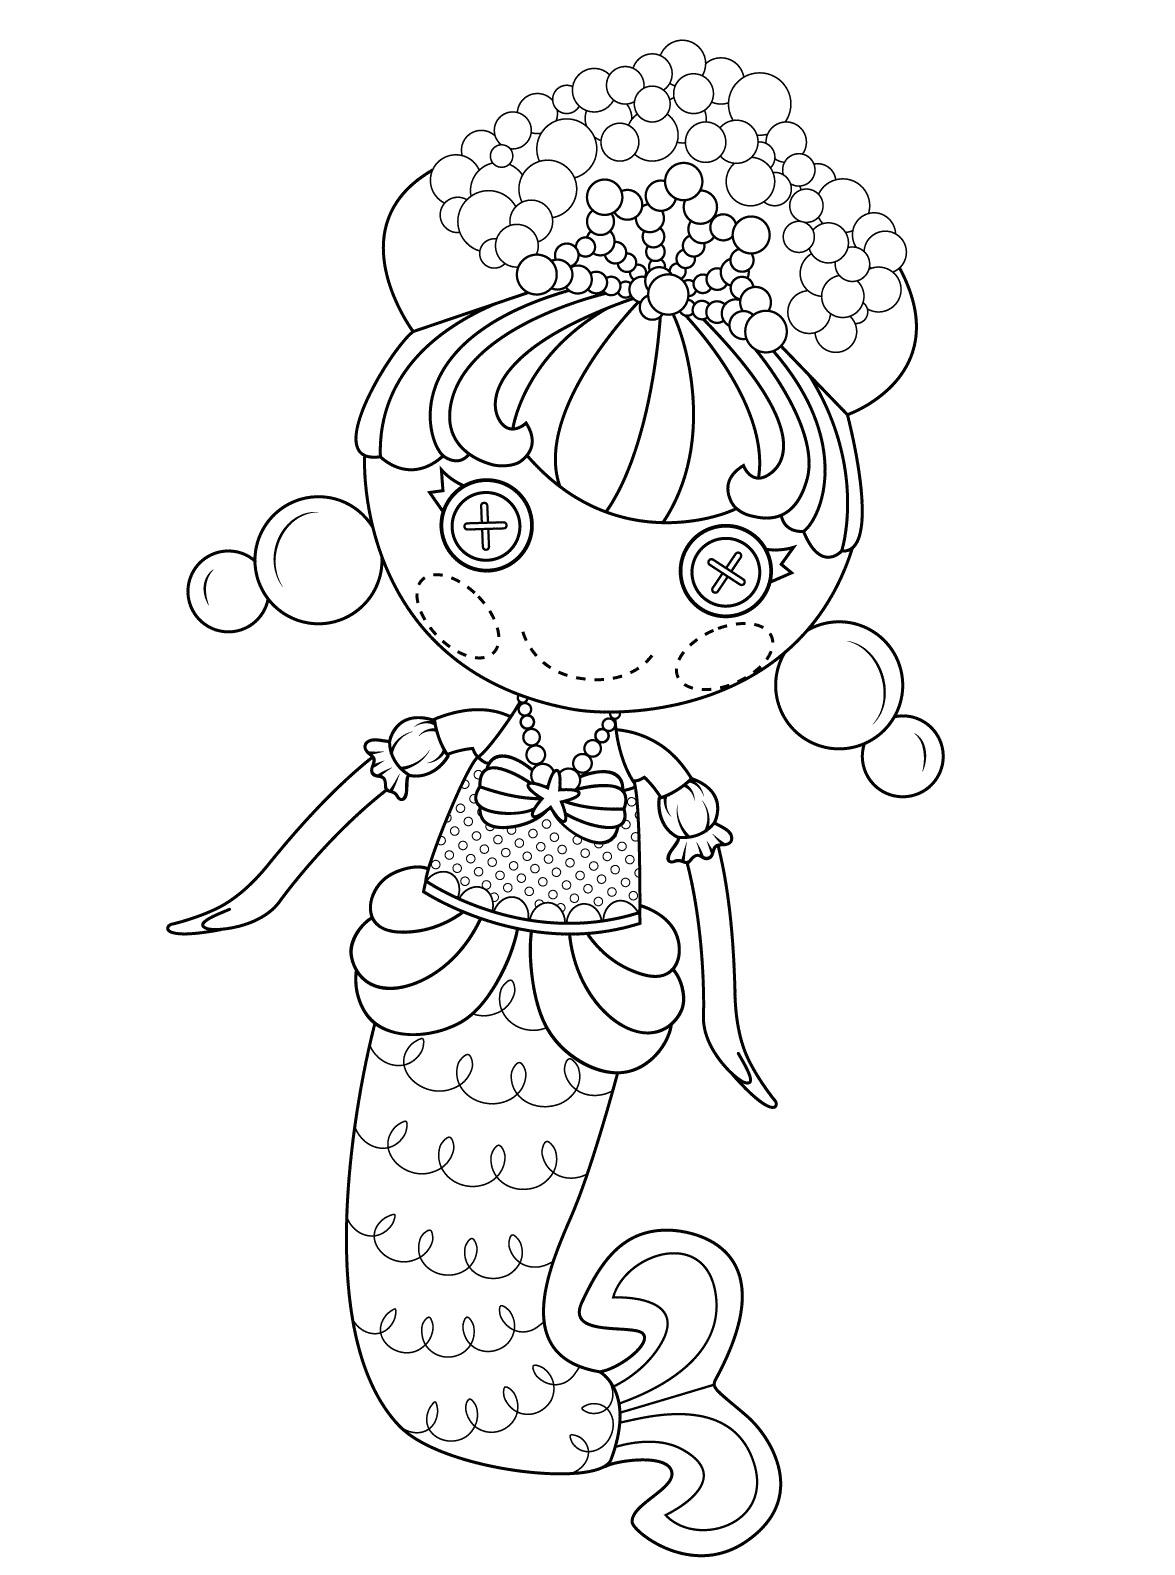 coloring pages lalaloopsy dolls lalaloopsy boy coloring pages to print lalaloopsy lalaloopsy coloring dolls pages